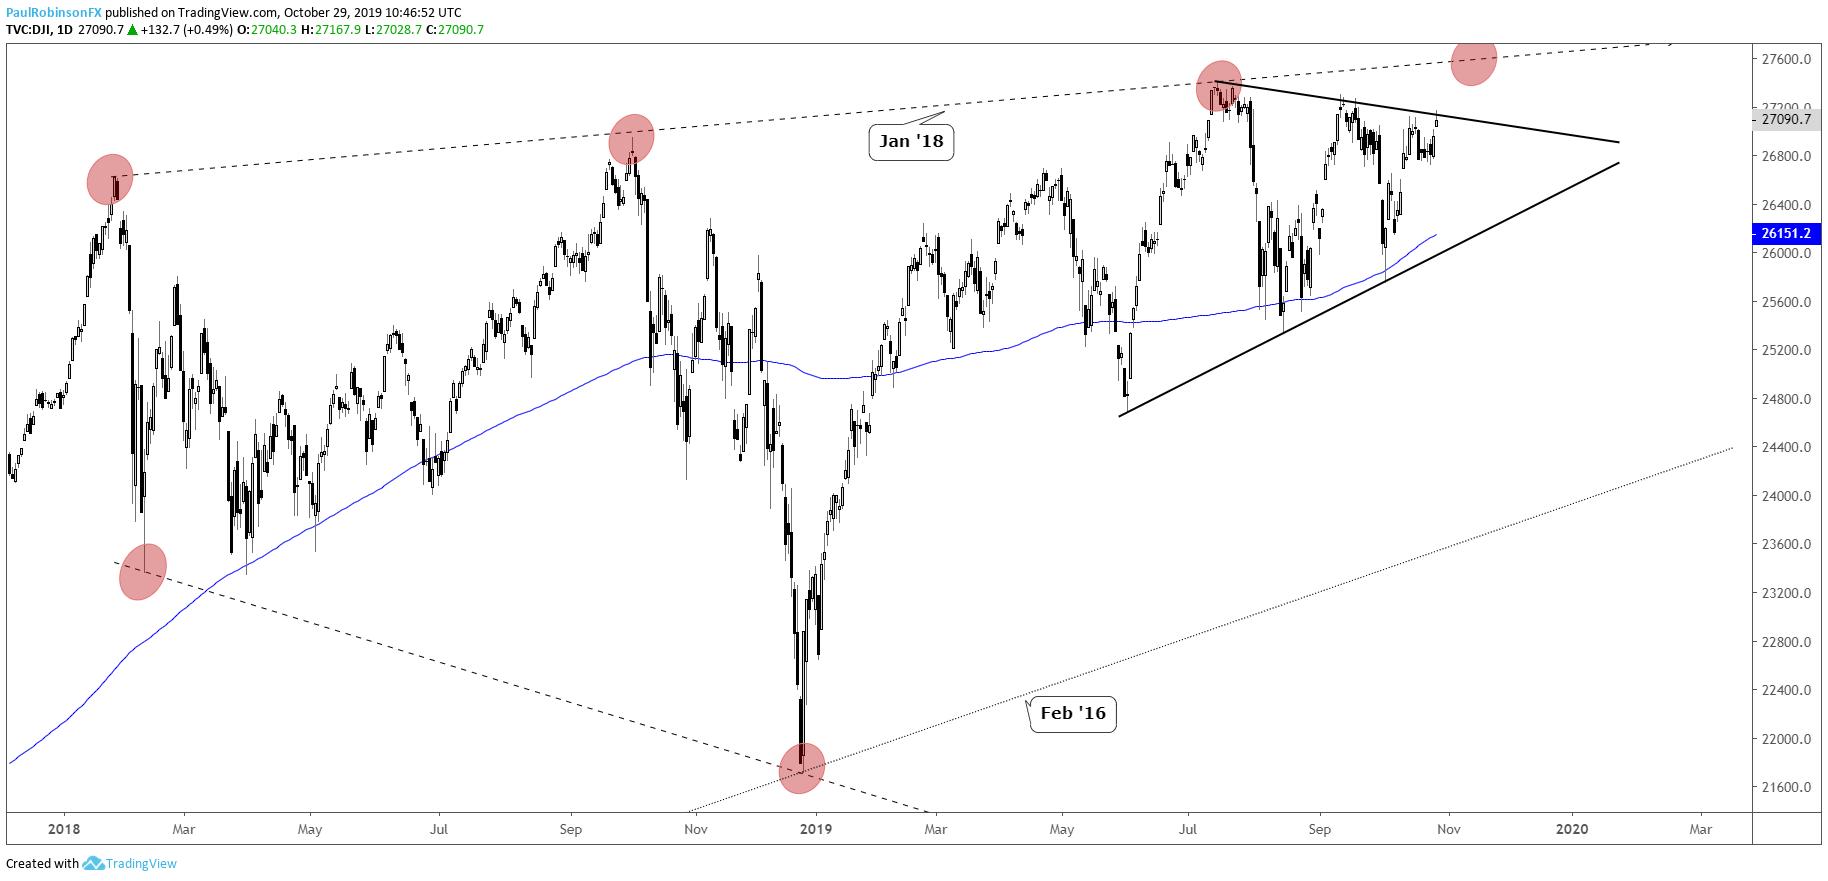 Dow Jones Sluggish, S&P 500, Nasdaq 100 New Records May Not Hold